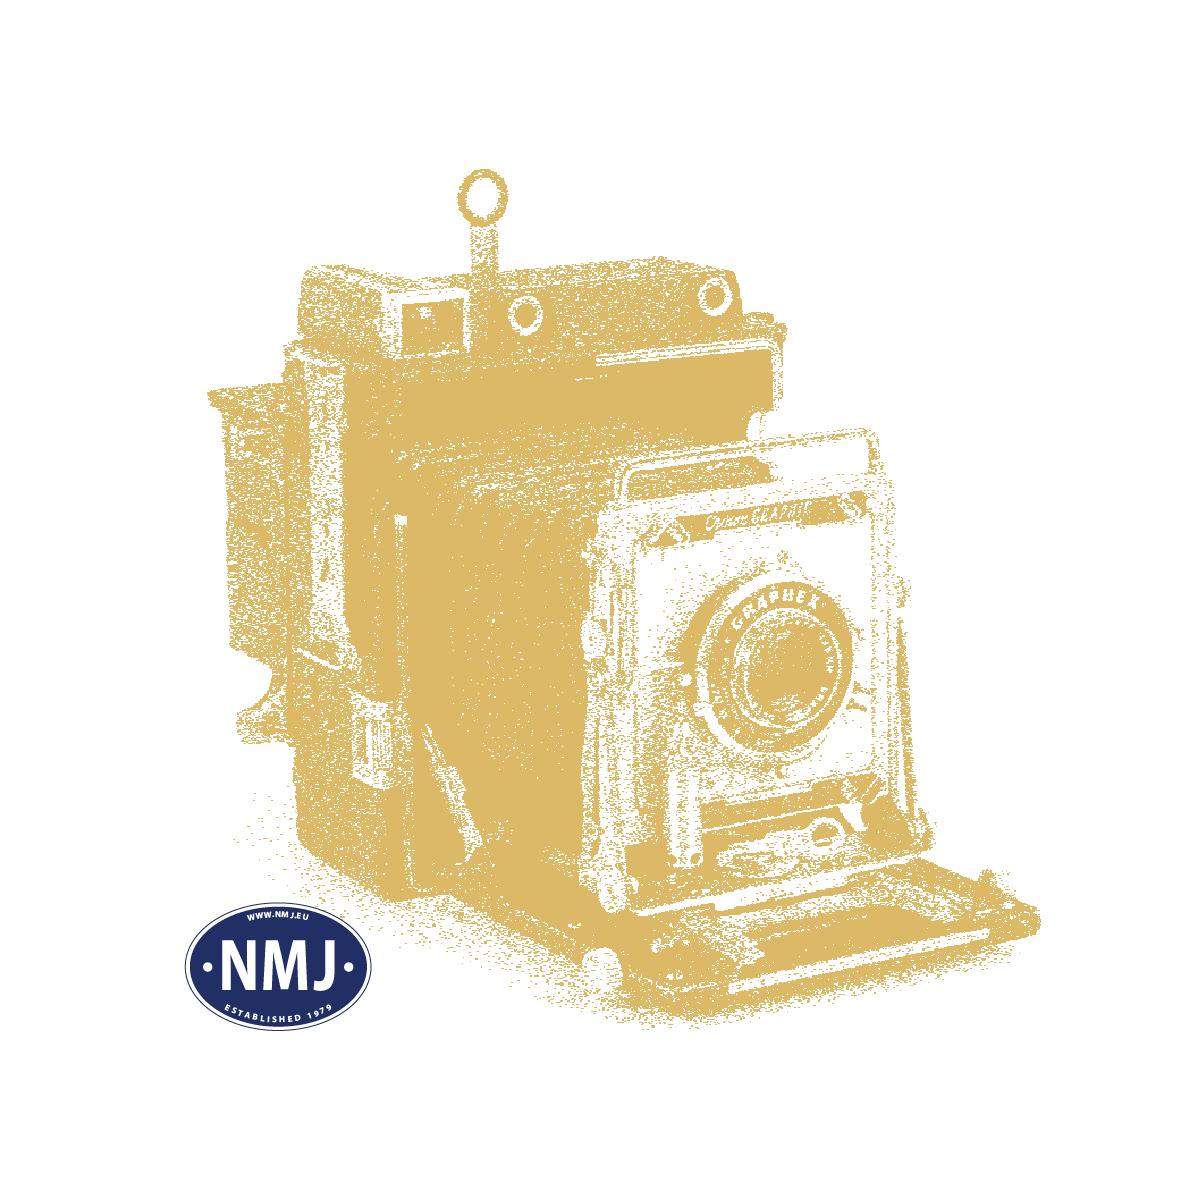 JOS25012 - Nordic Villa, Yellow, Laser-cut Kit